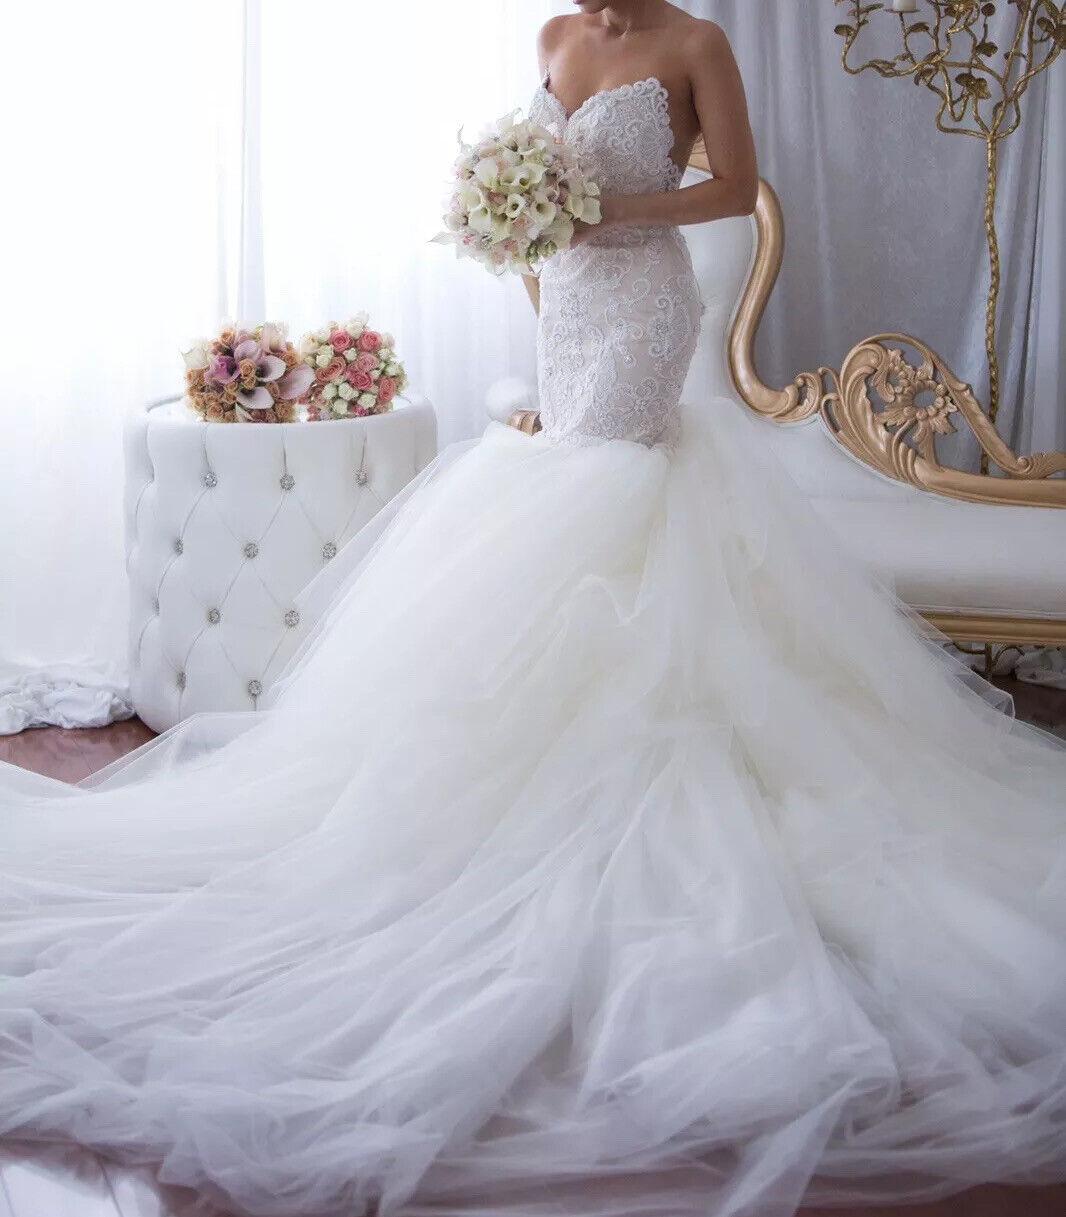 Custom lace crystal couture designer Wedding Dress - image 3